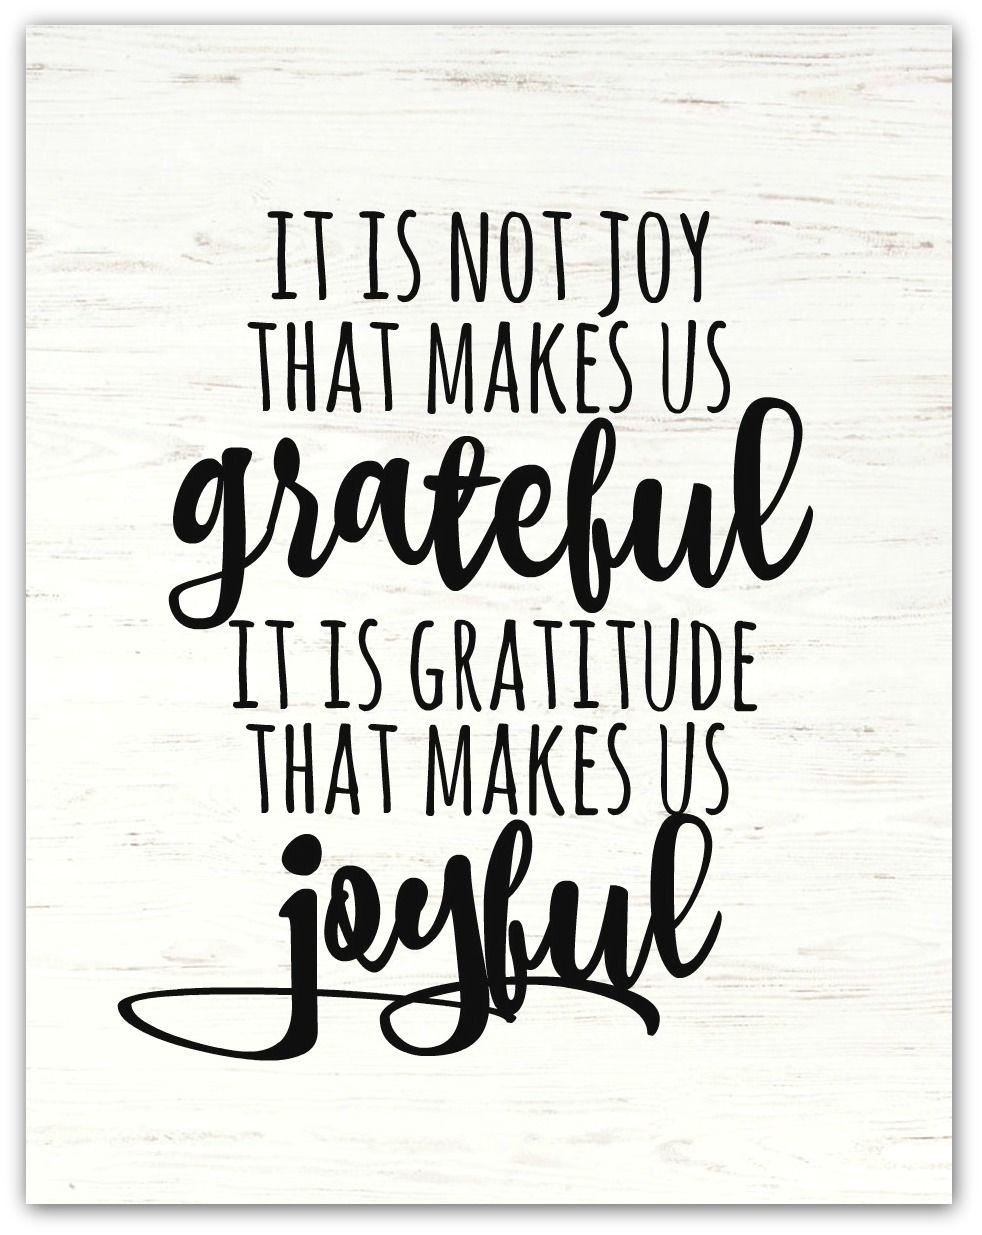 Gratitude Makes Us Joyful! {Farmhouse Printable